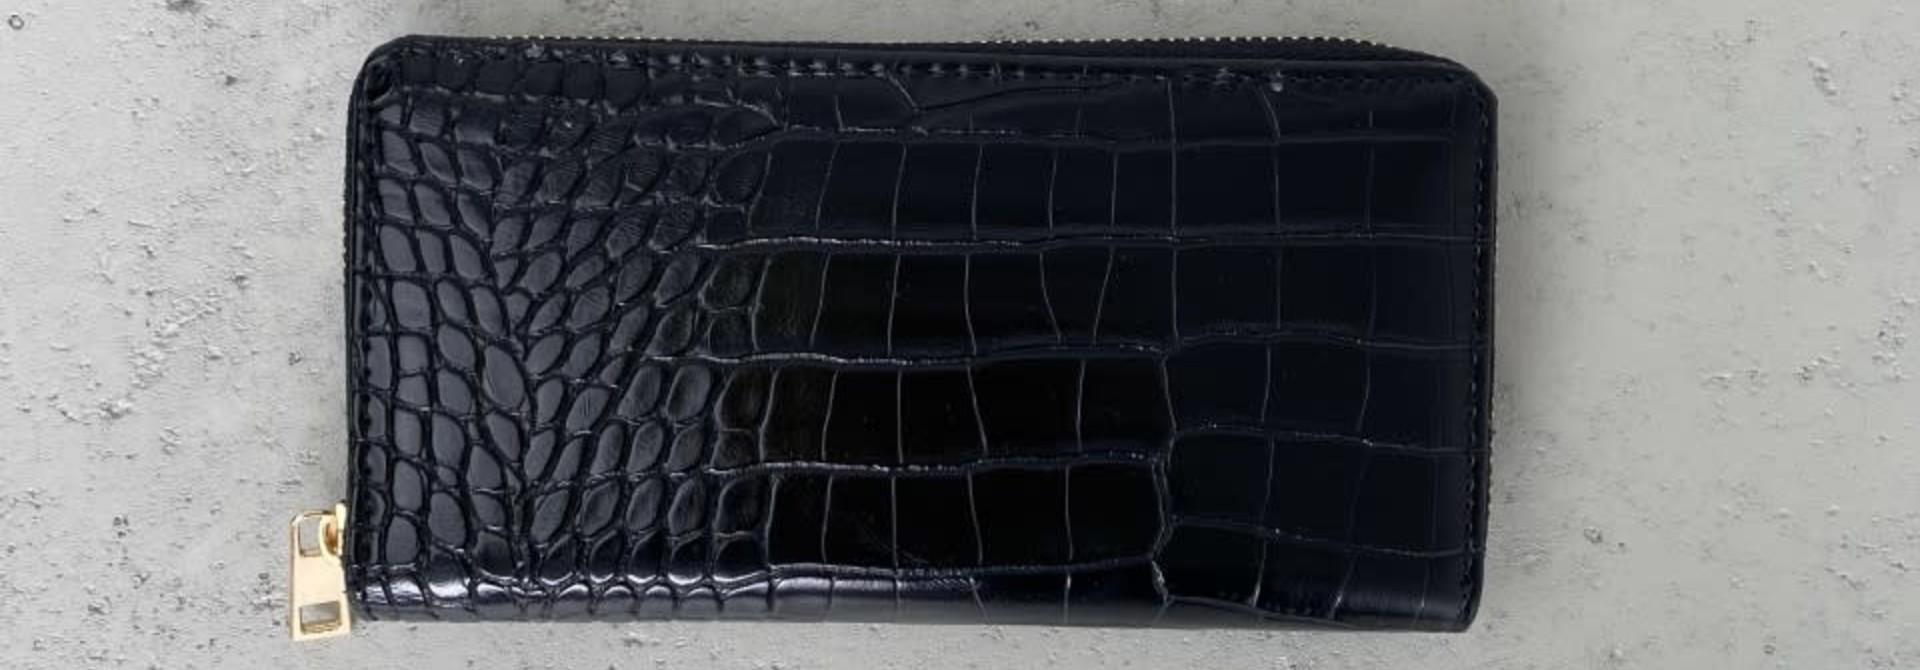 Thylin croco wallet Black